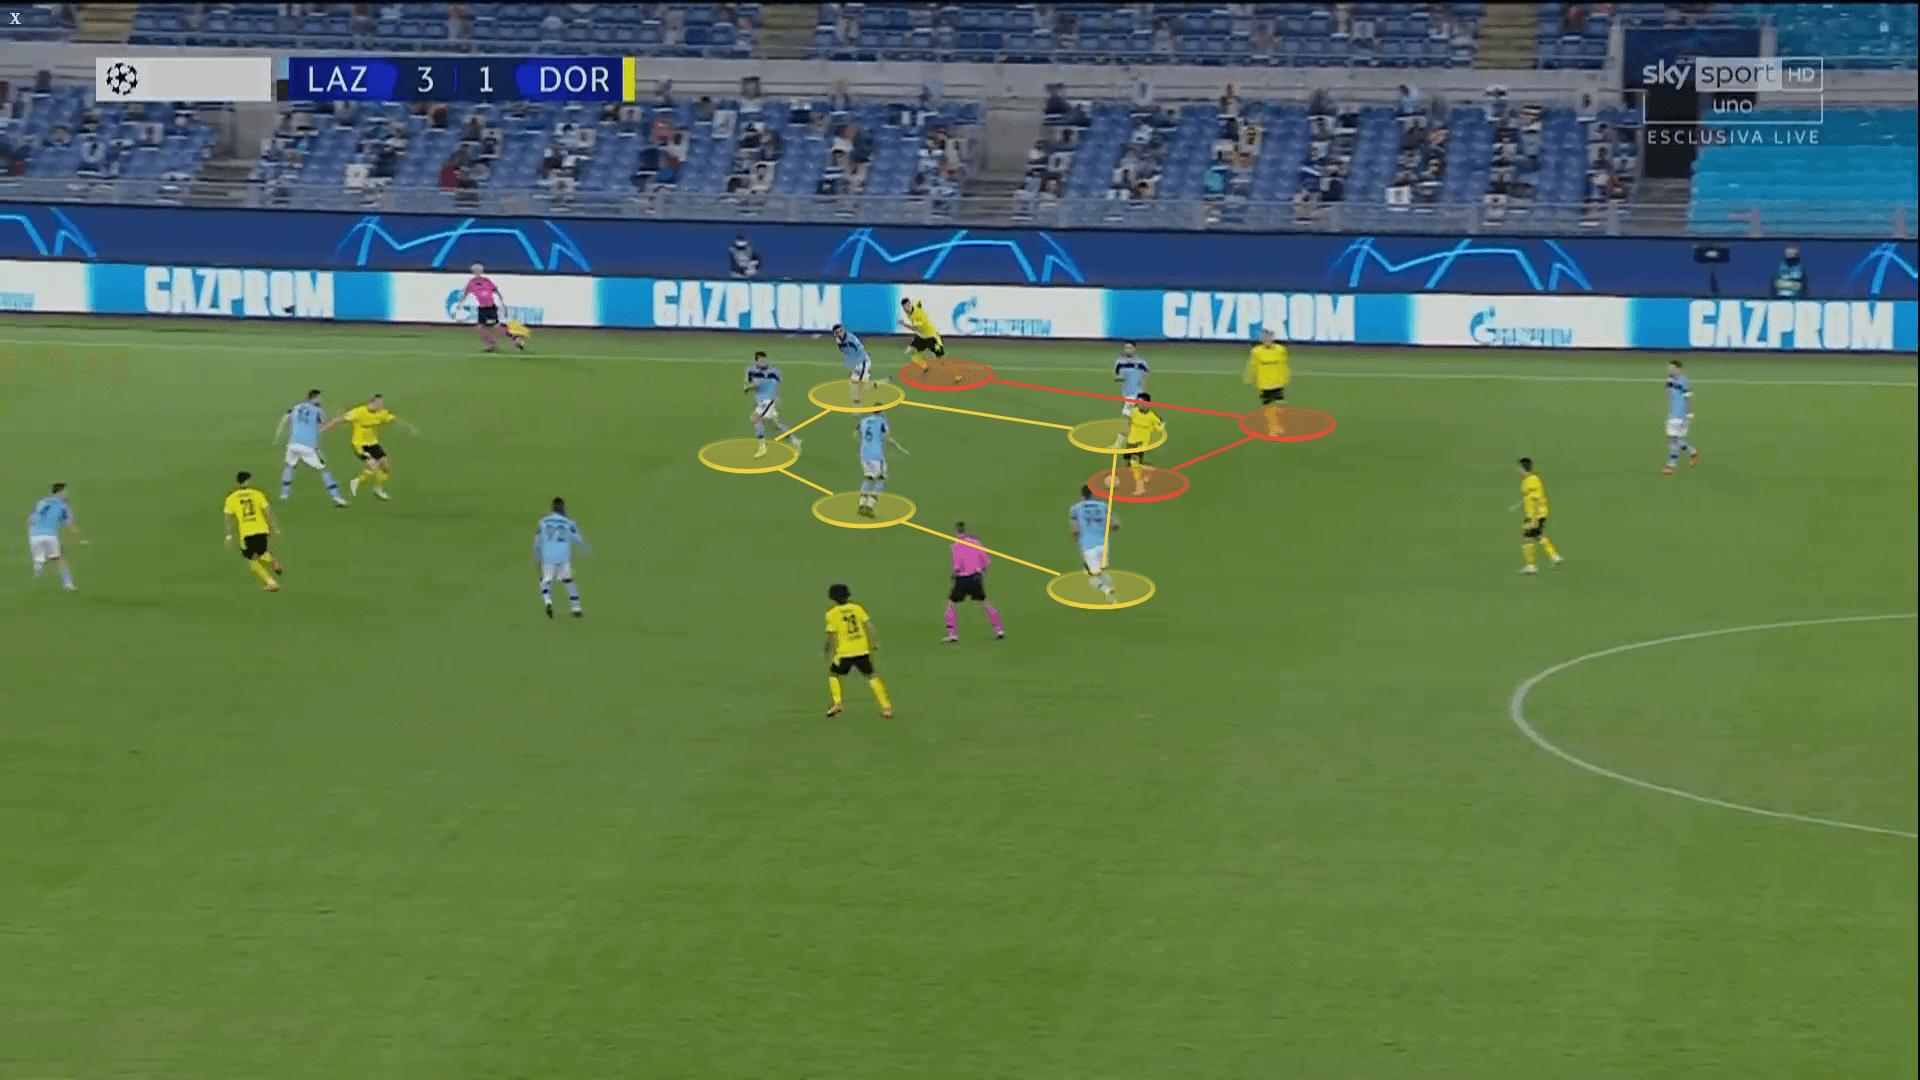 UEFA Champions League 2020/2021: Lazio vs Borussia Dortmund - tactical analysis tactics